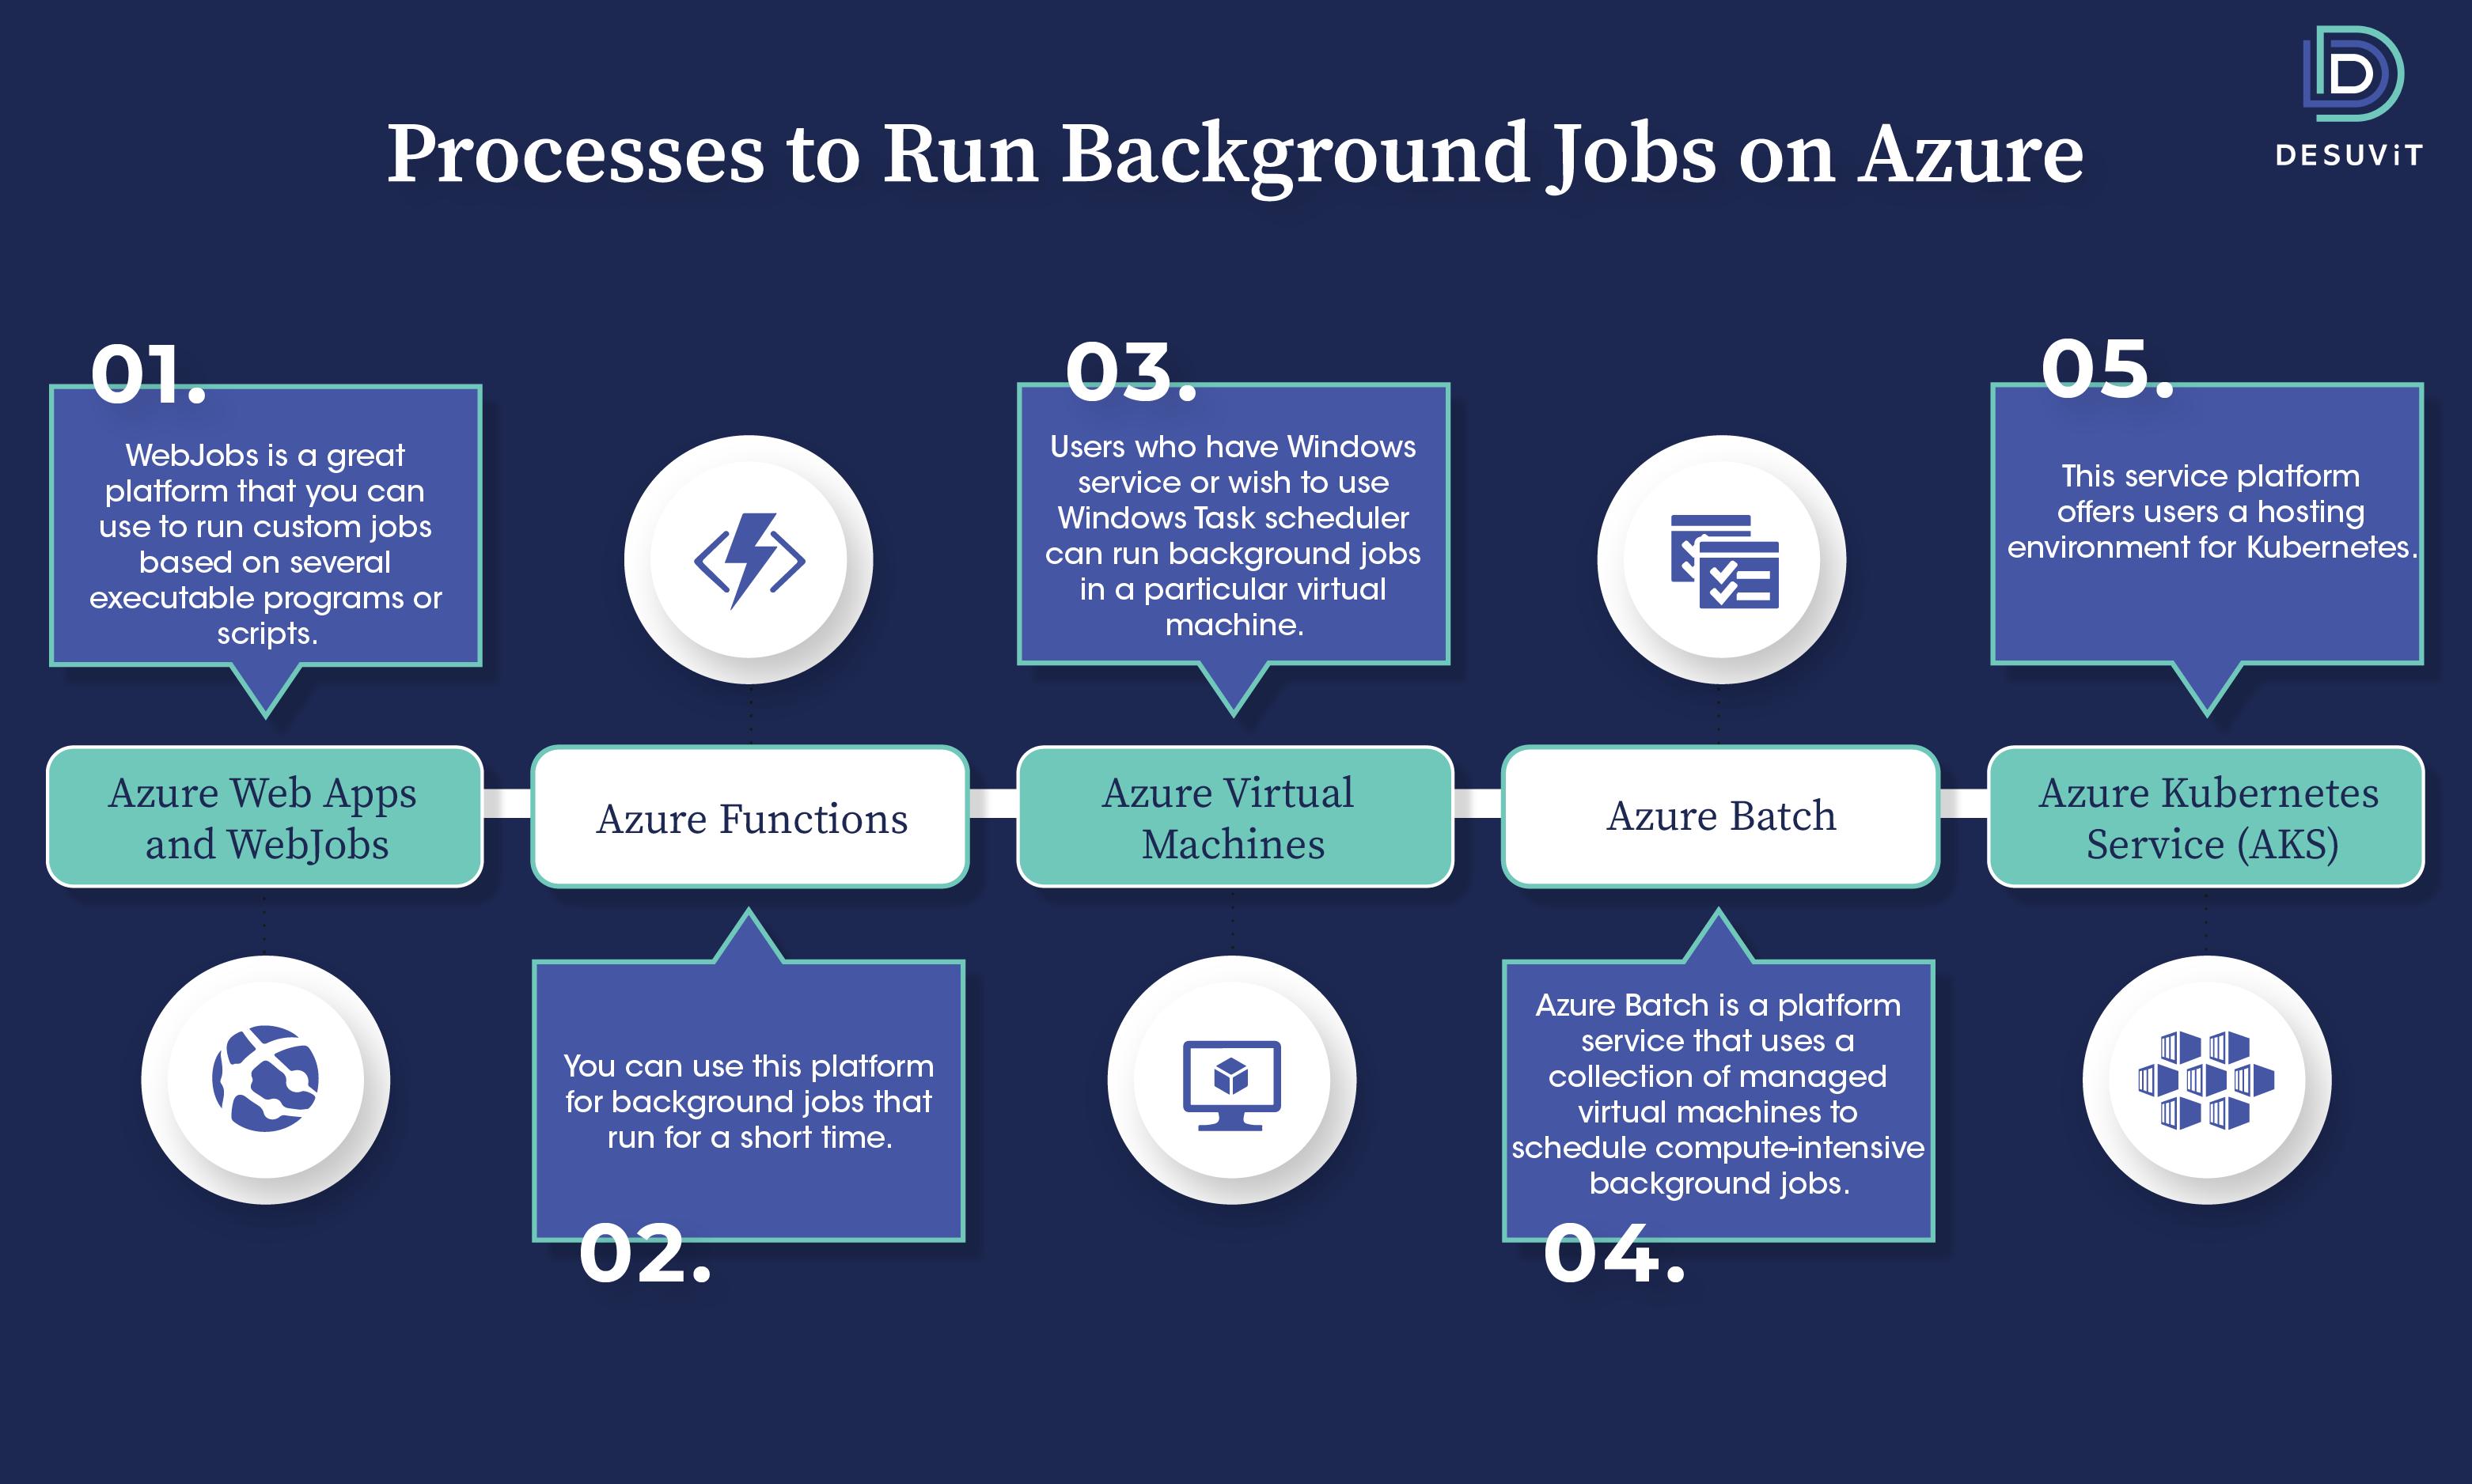 Background jobs on Azure